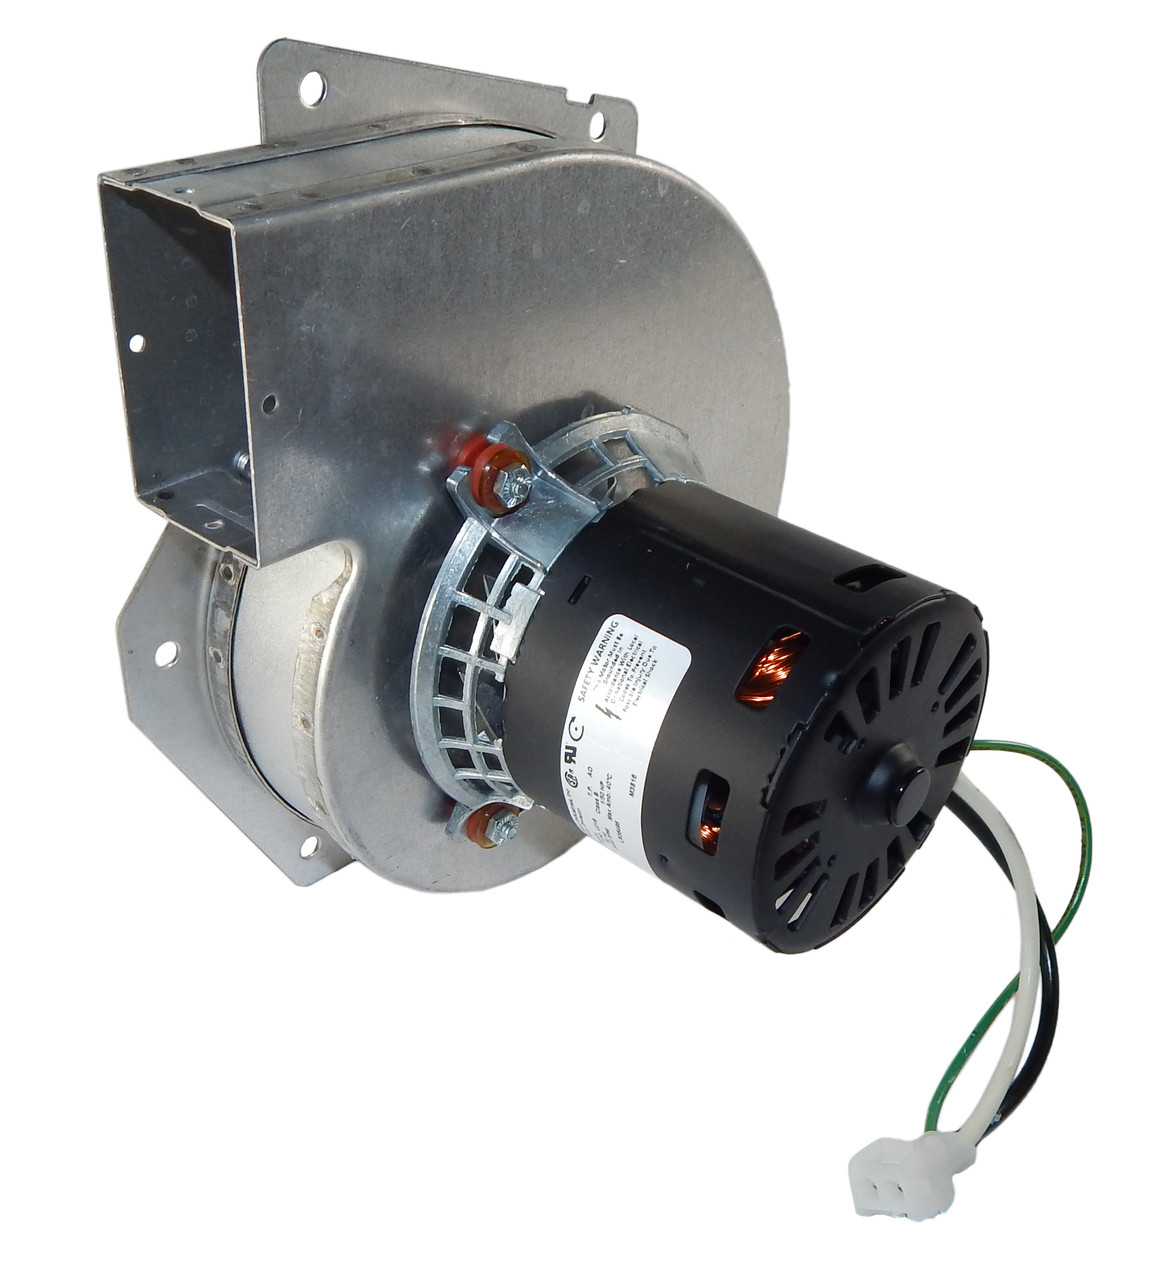 hight resolution of trane furnace draft inducer blower jakel j238 138 1344 115v fasco a143